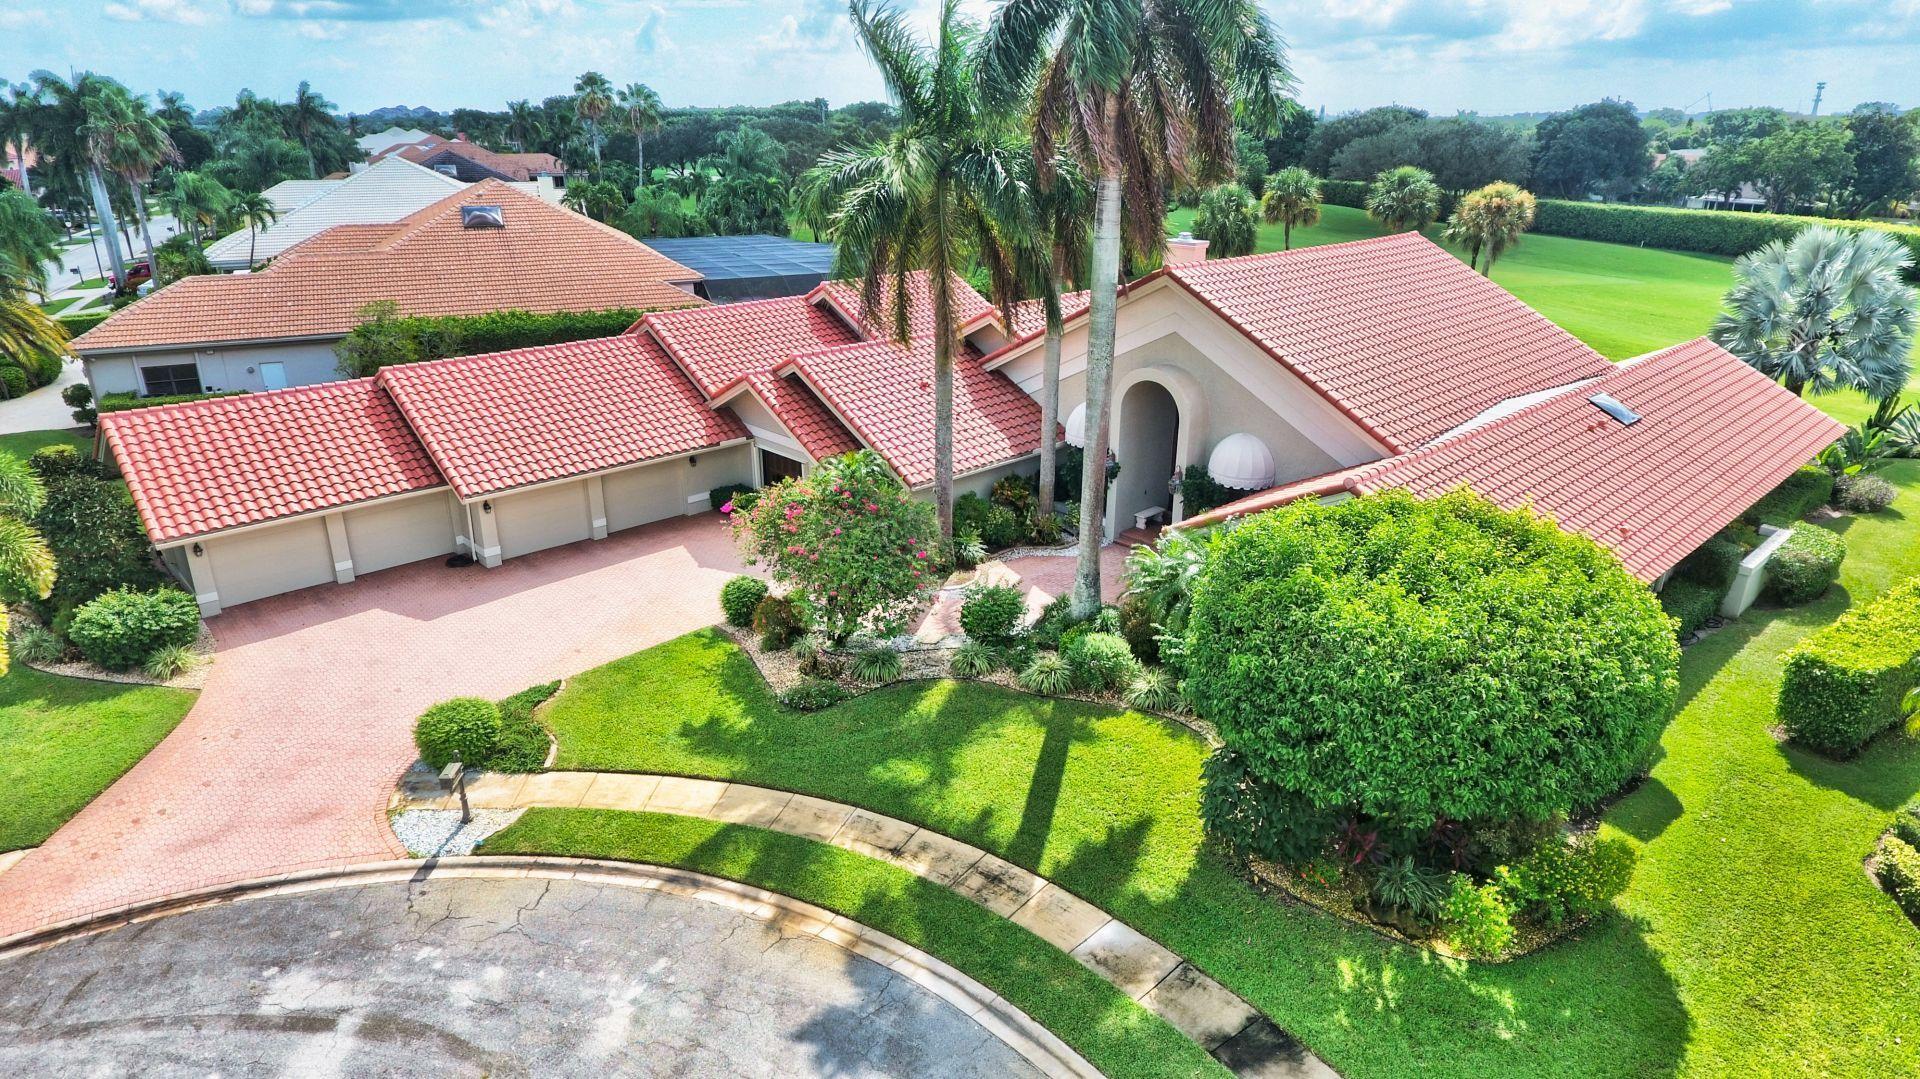 Photo of 4832 Chamal Circle, Boca Raton, FL 33487